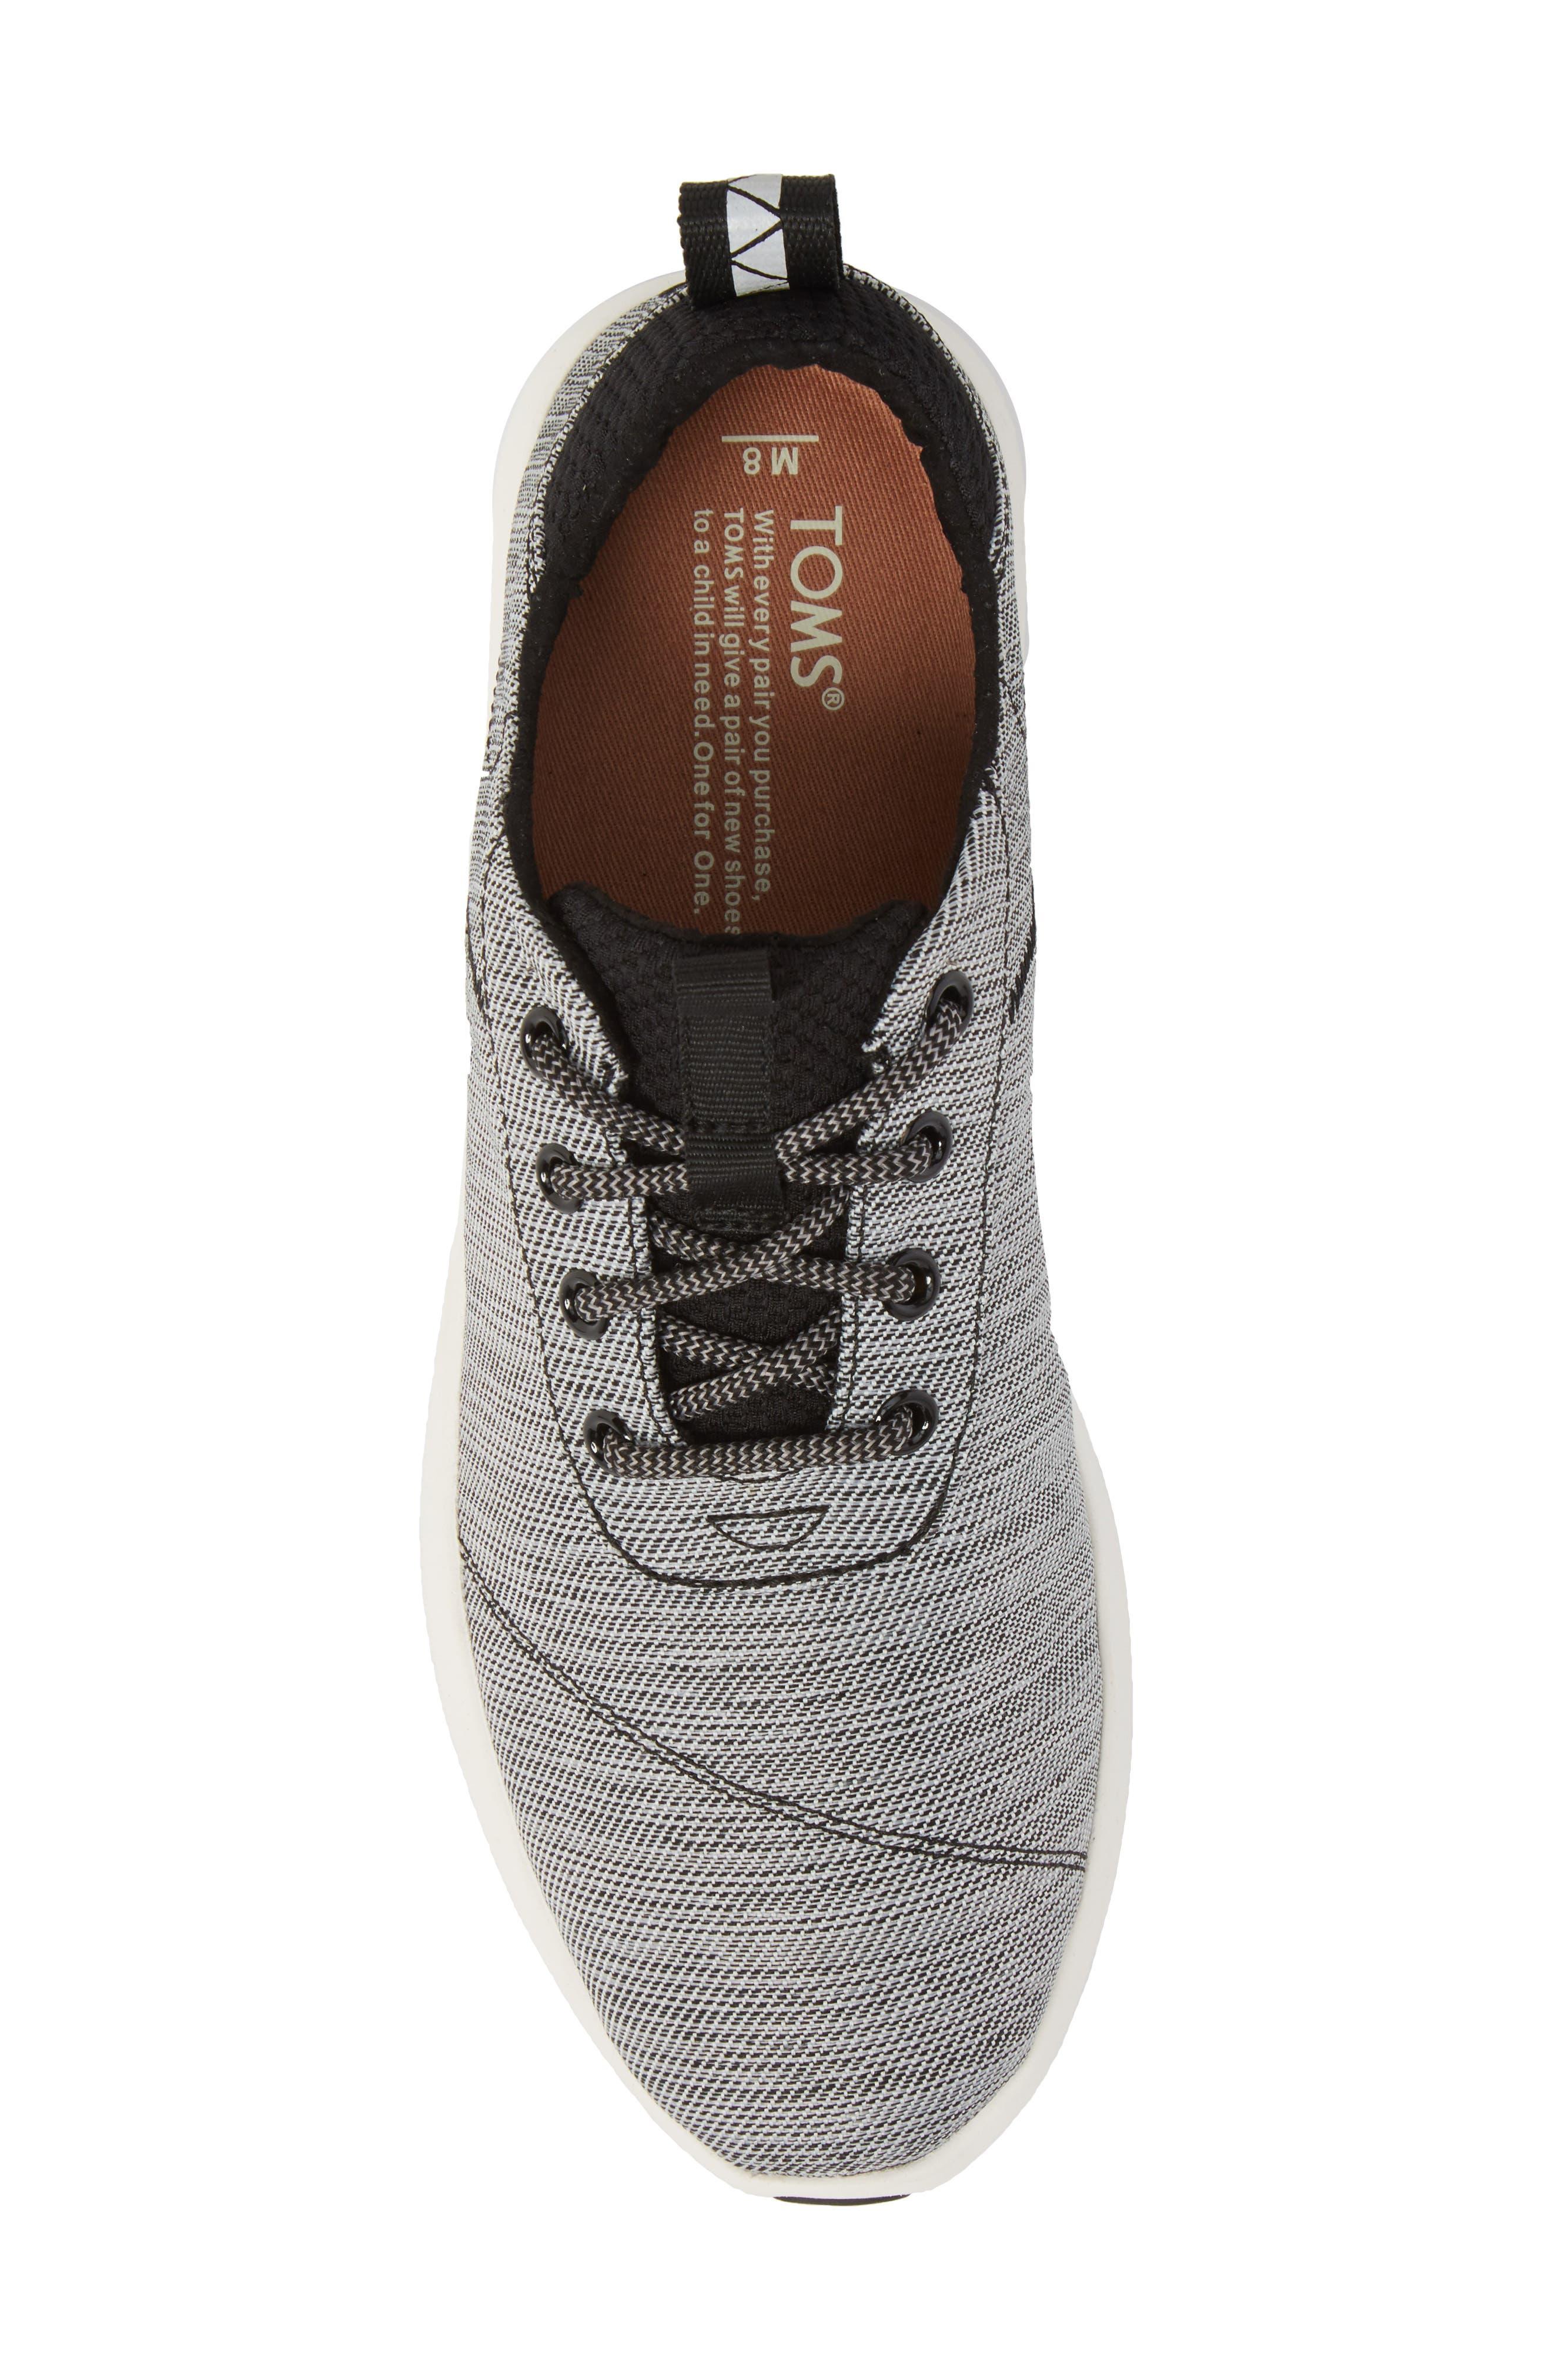 Cabrillo Sneaker,                             Alternate thumbnail 5, color,                             BLACK SPACE-DYE